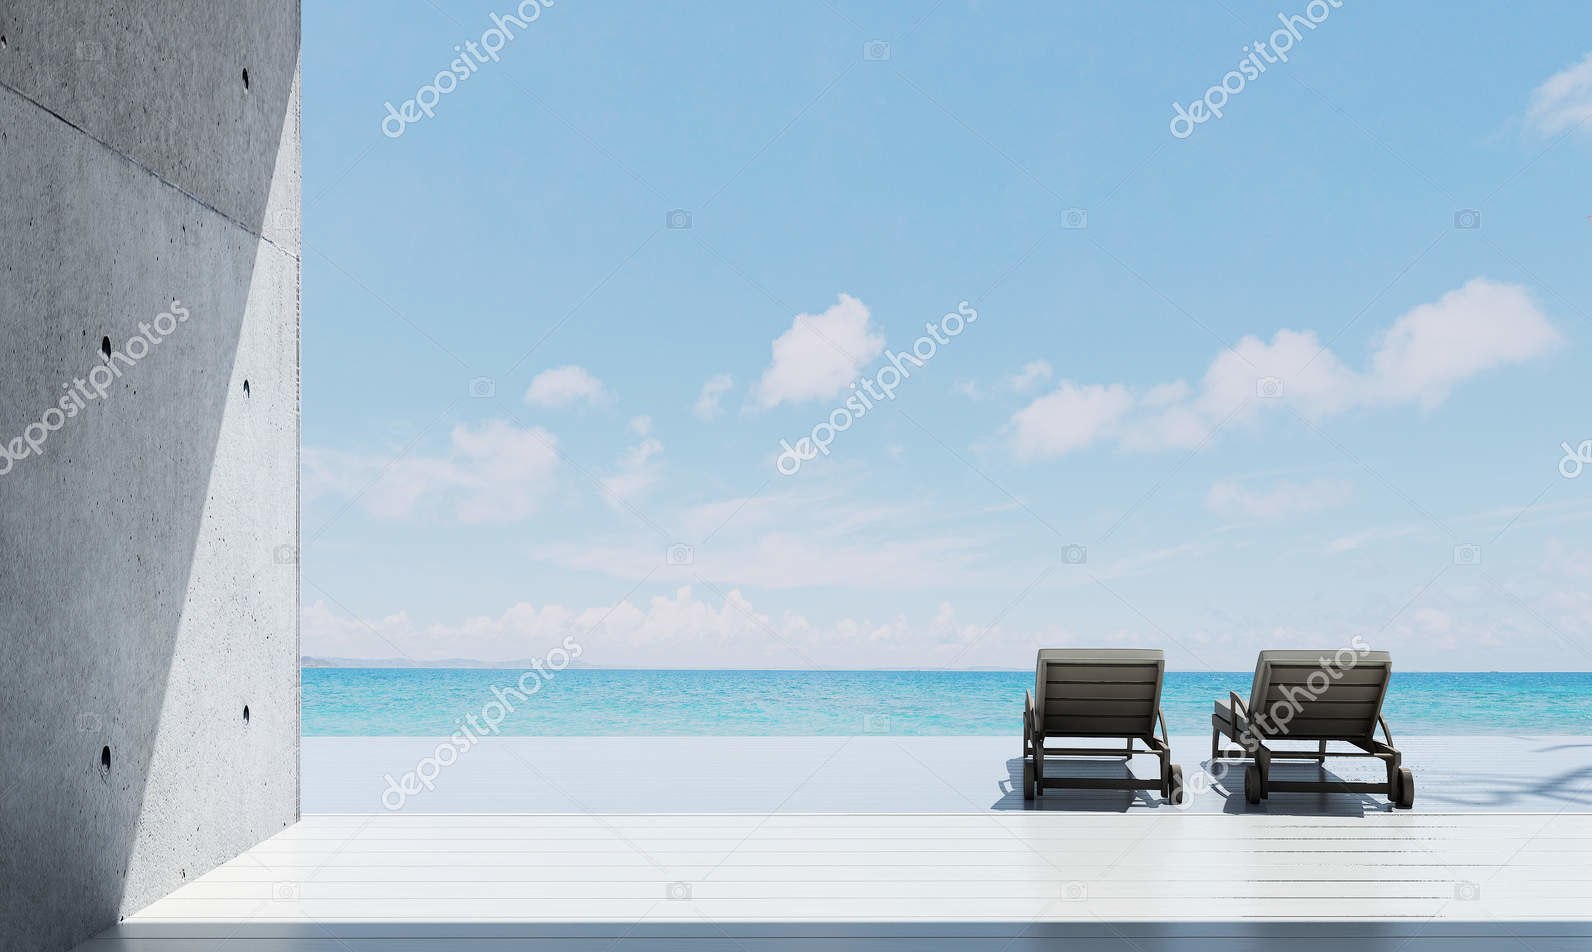 Вид на морской пейзаж